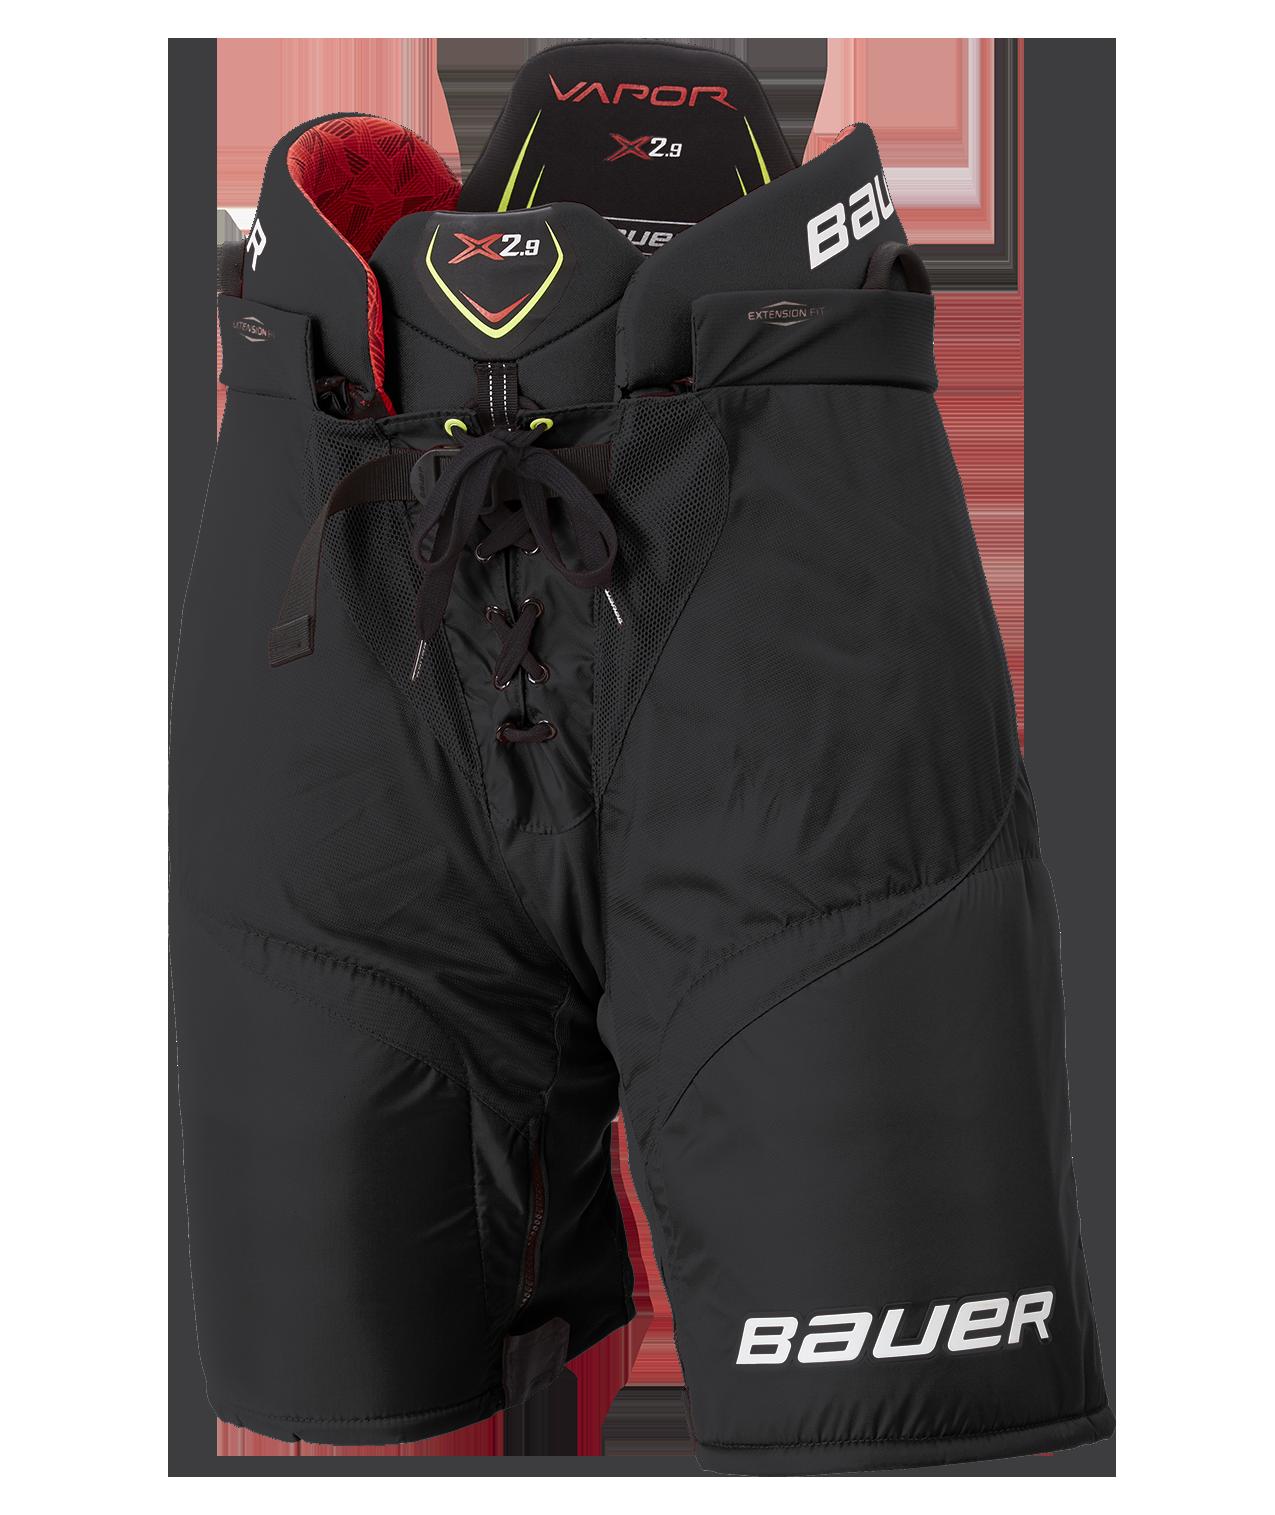 Hokejové nohavice Bauer Vapor X2.9 JR